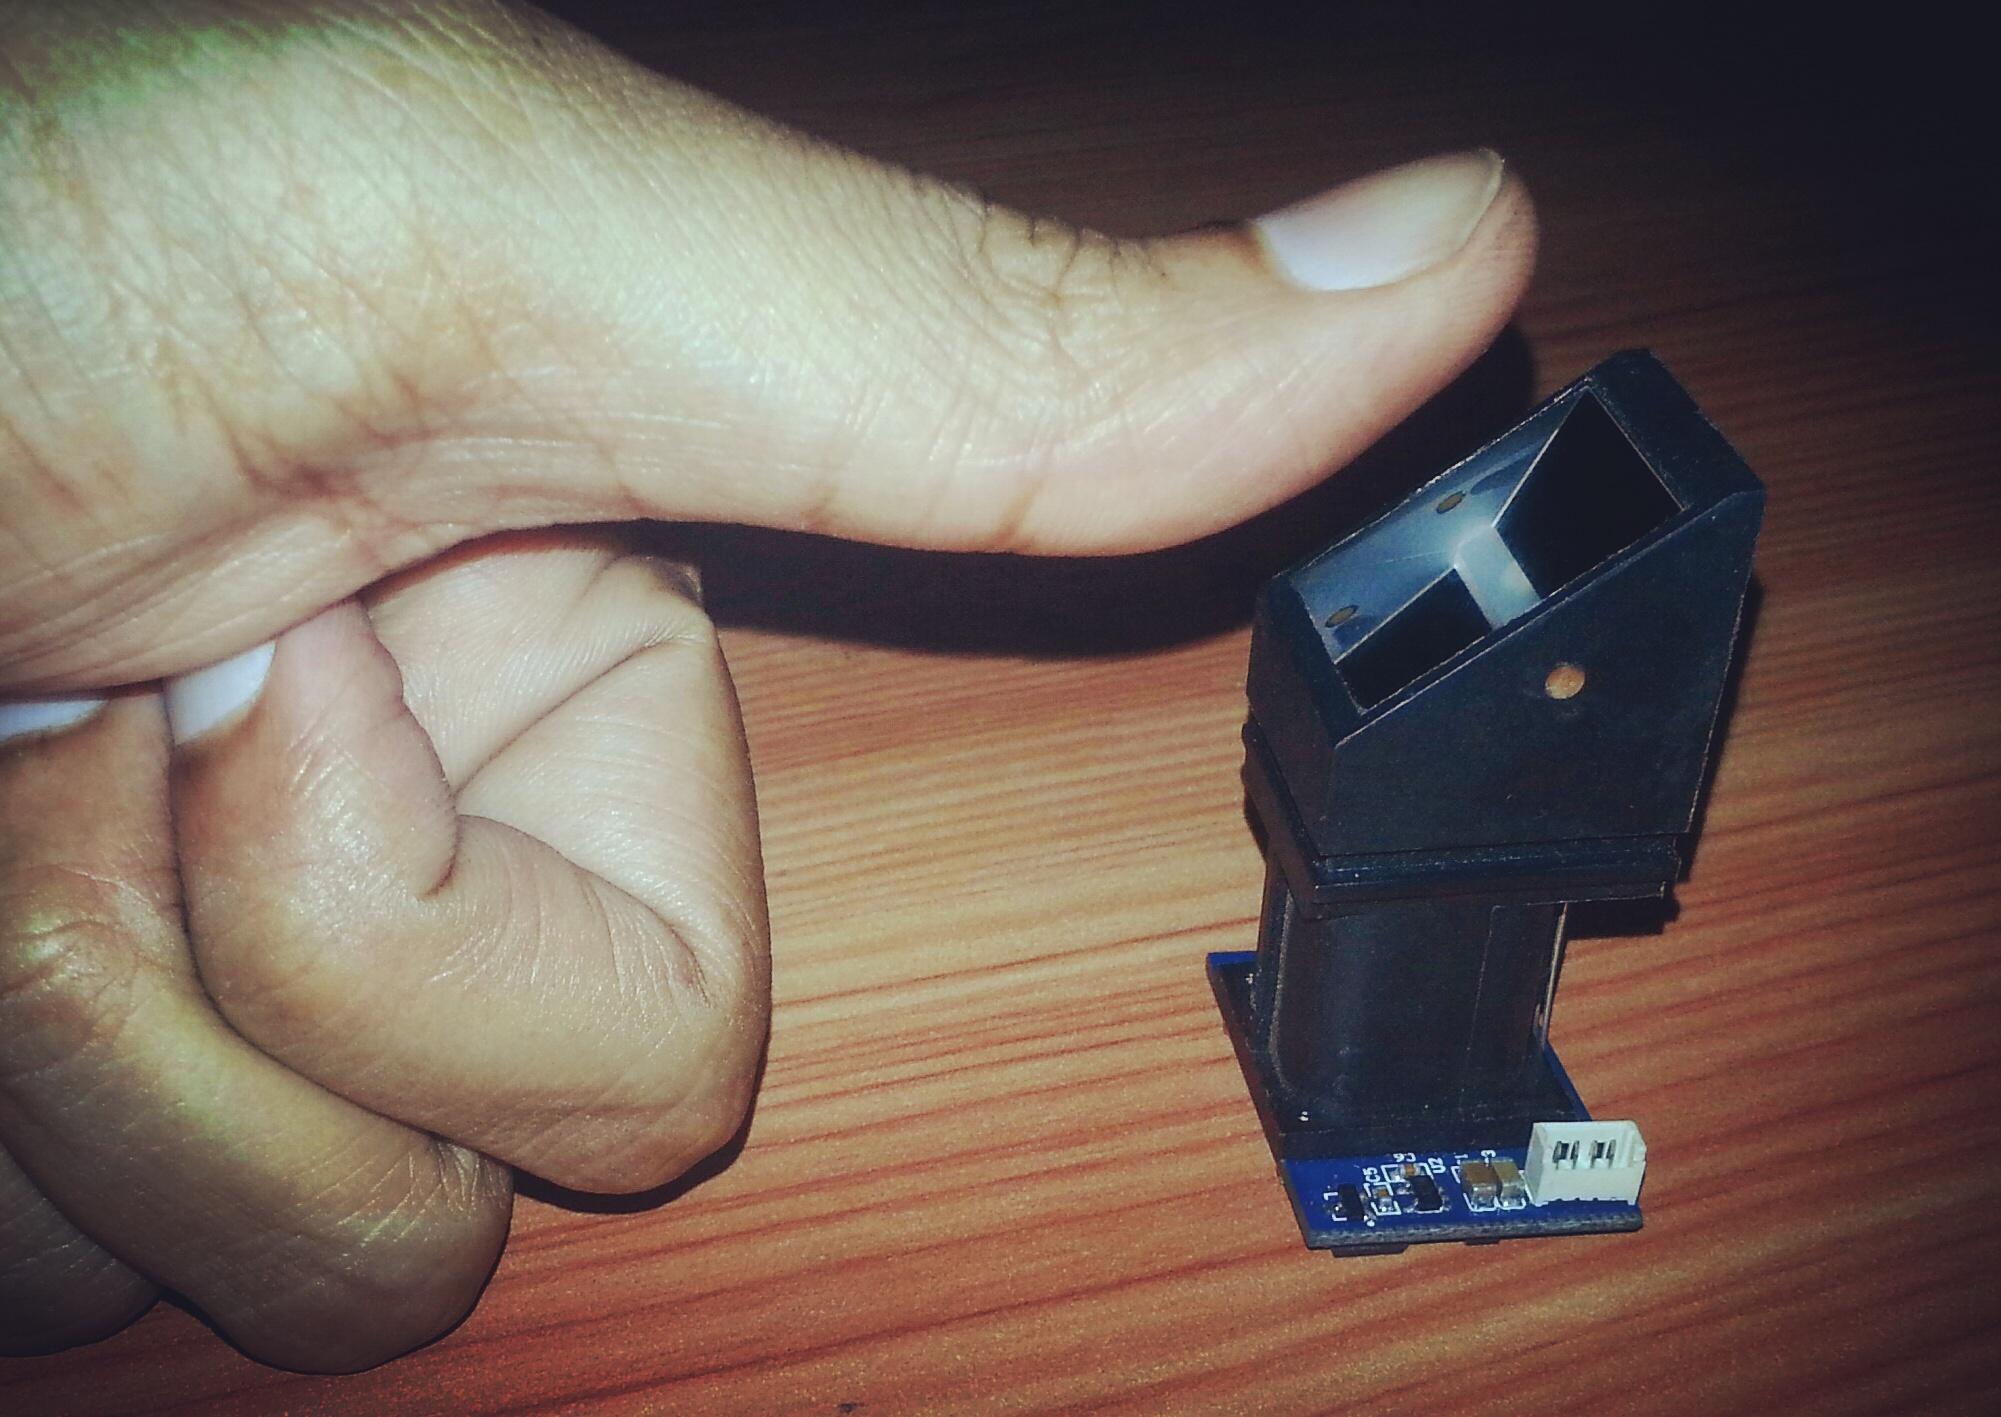 R305 Fingerprint Identification Module - Python and MySQL